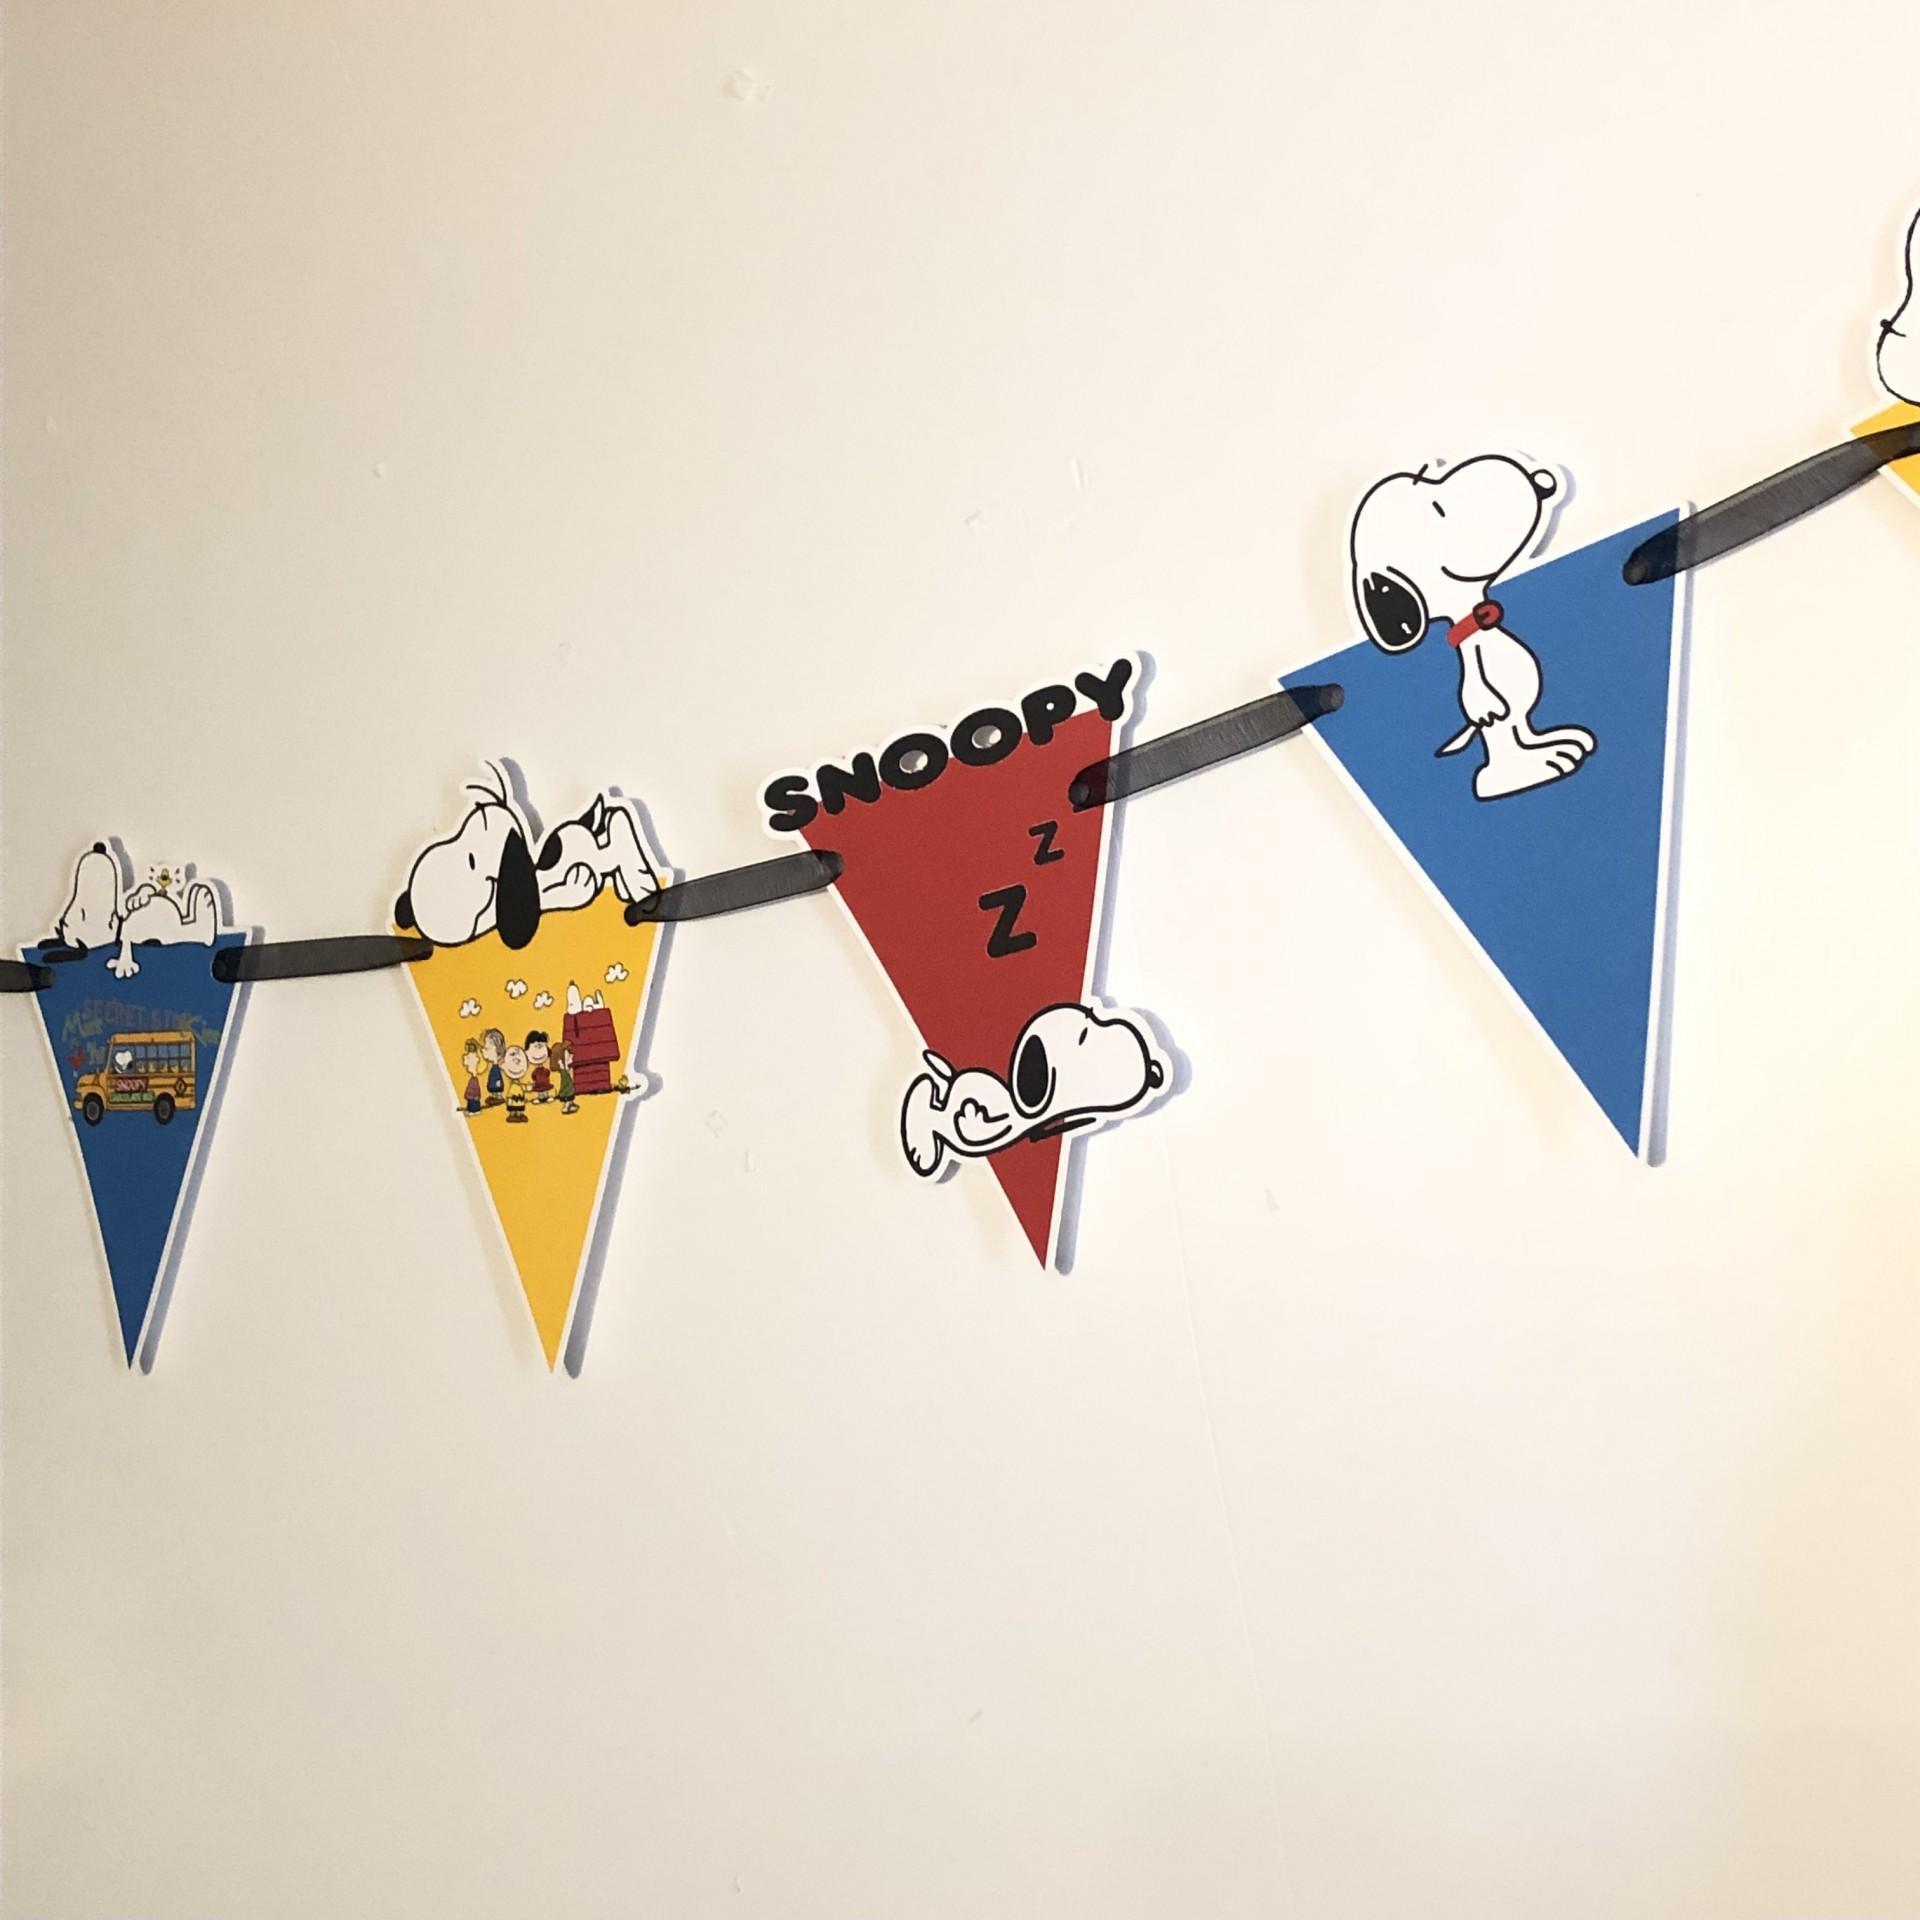 Grinalda de Bandeirolas Snoopy